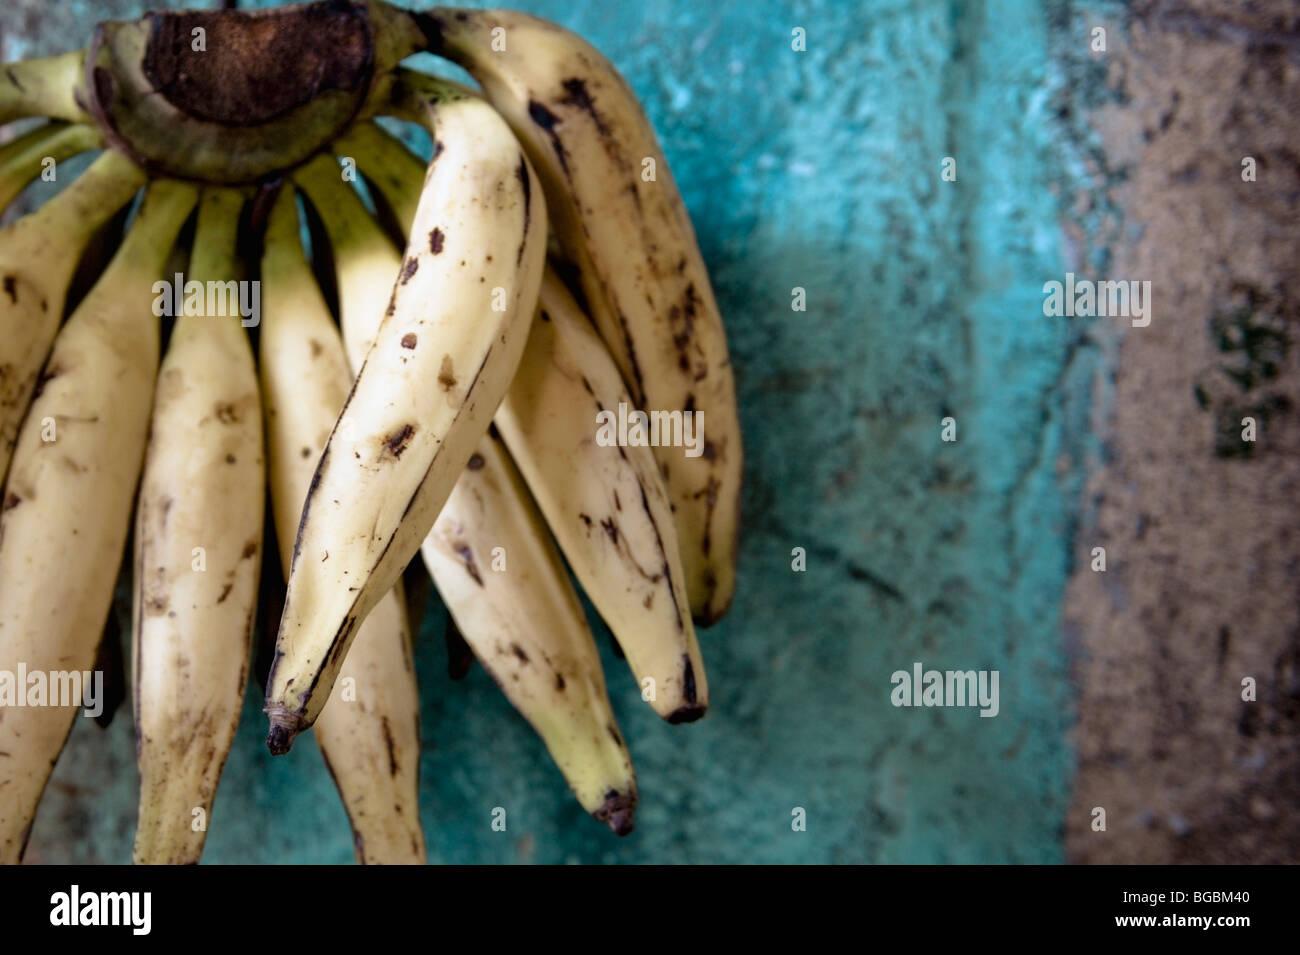 Bruised bananas - Stock Image